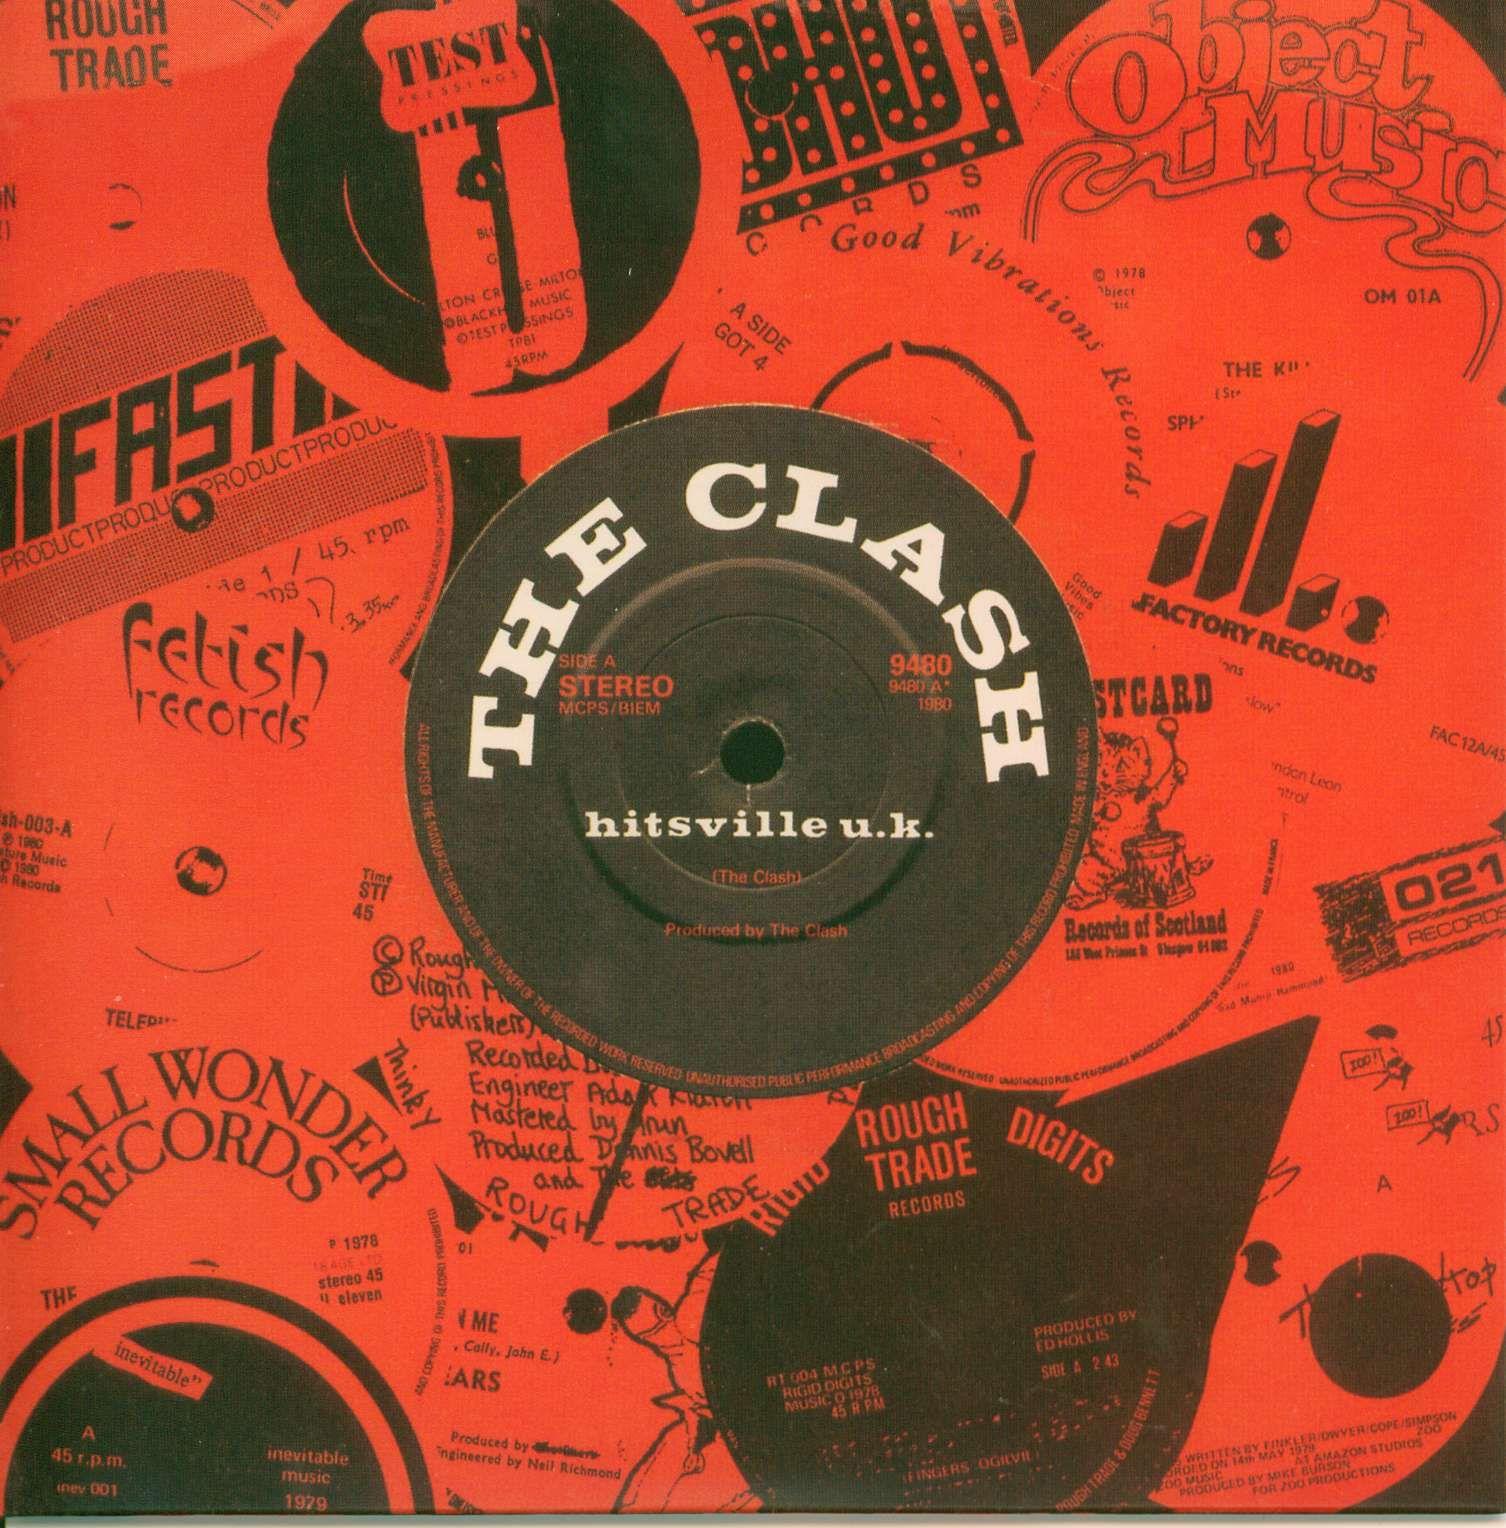 The Clash Hitsville Uk